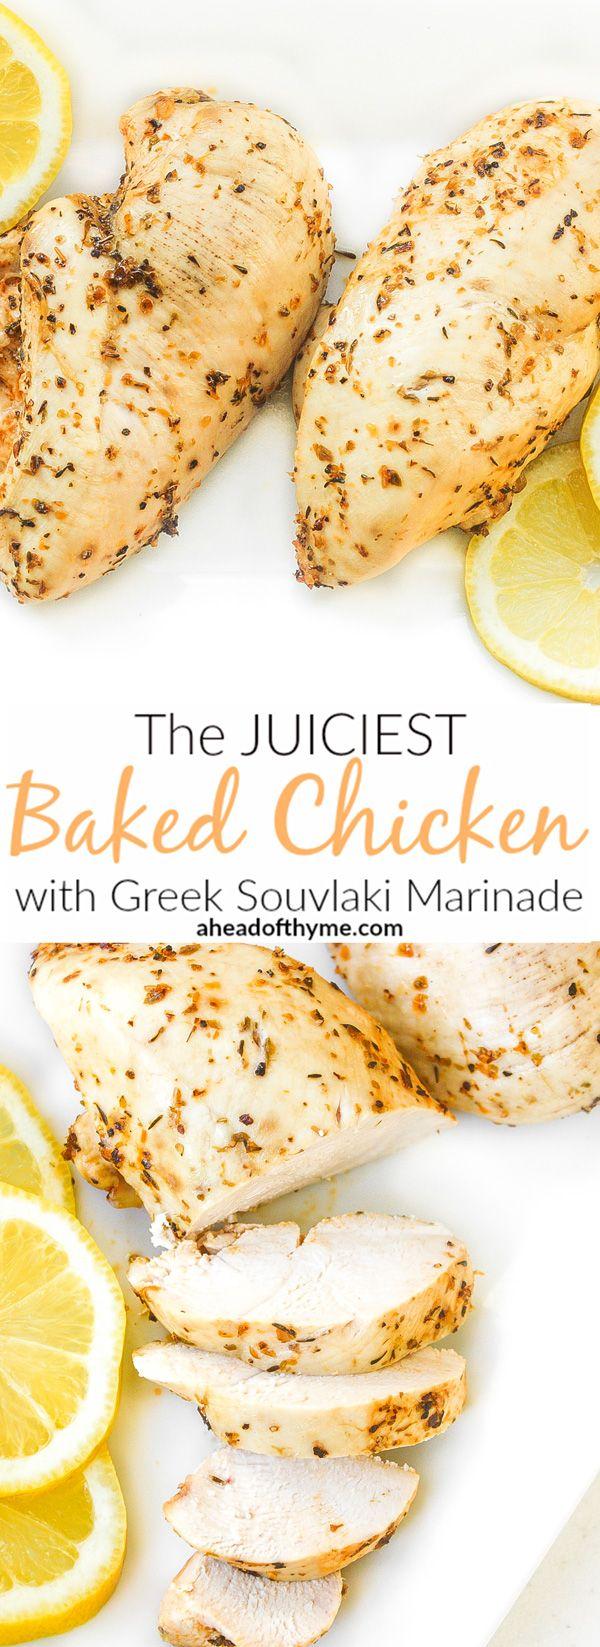 The Juiciest Baked Chicken Breast with Greek Souvlaki Marinade: Imagine baked…